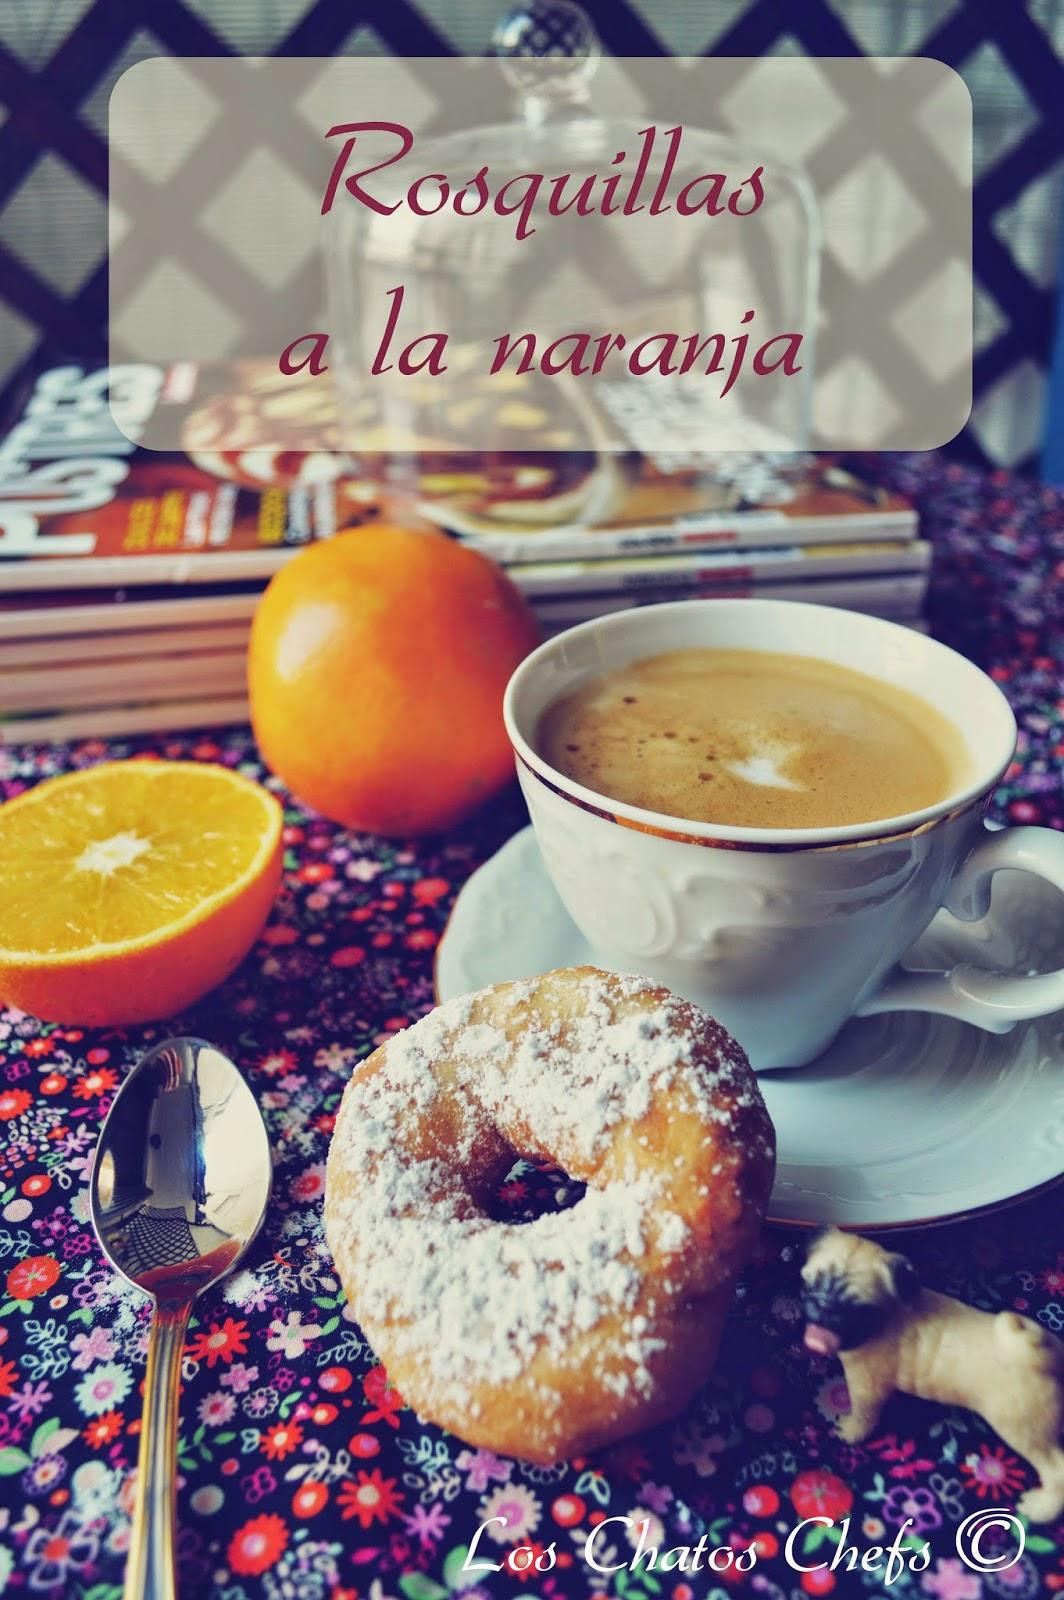 Rosquillas a la naranja